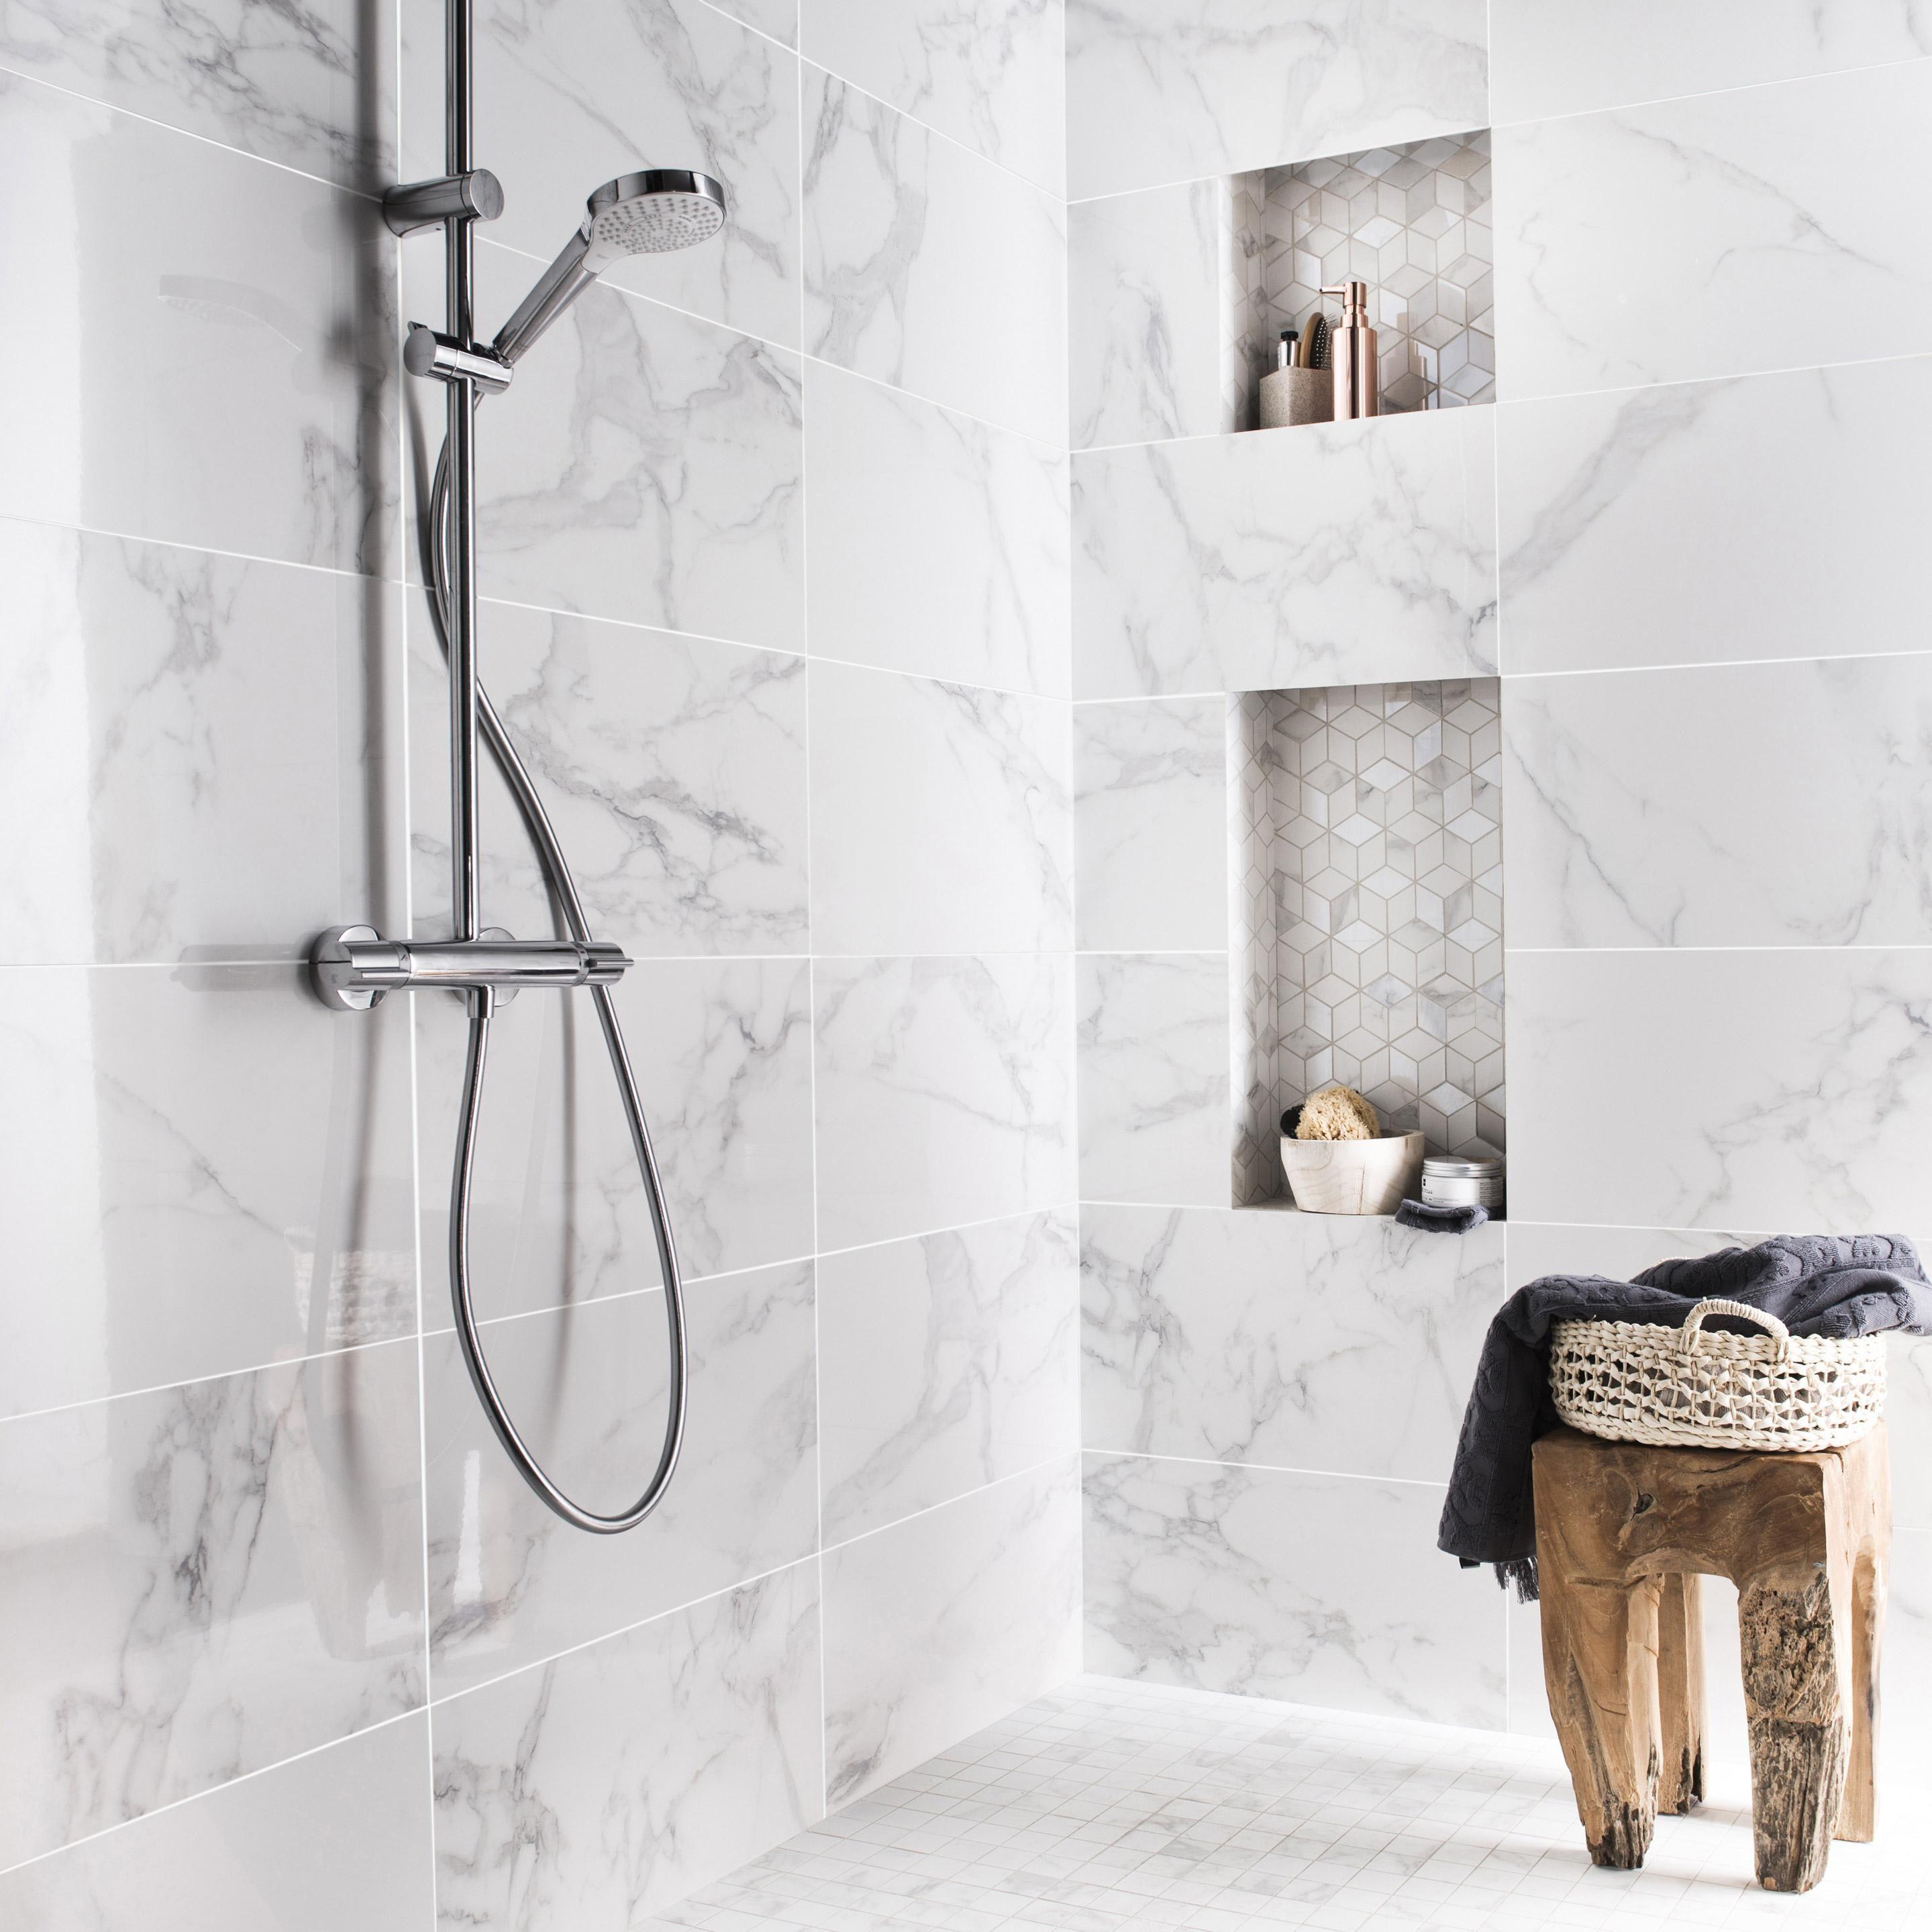 Carrelage Mur Marbre Blanc Carrare Brillant L 30 5 X L 56 Cm Murano En 2020 Relooking Salle De Bain Salle De Bains Chics Et Carrelage Salle De Bain